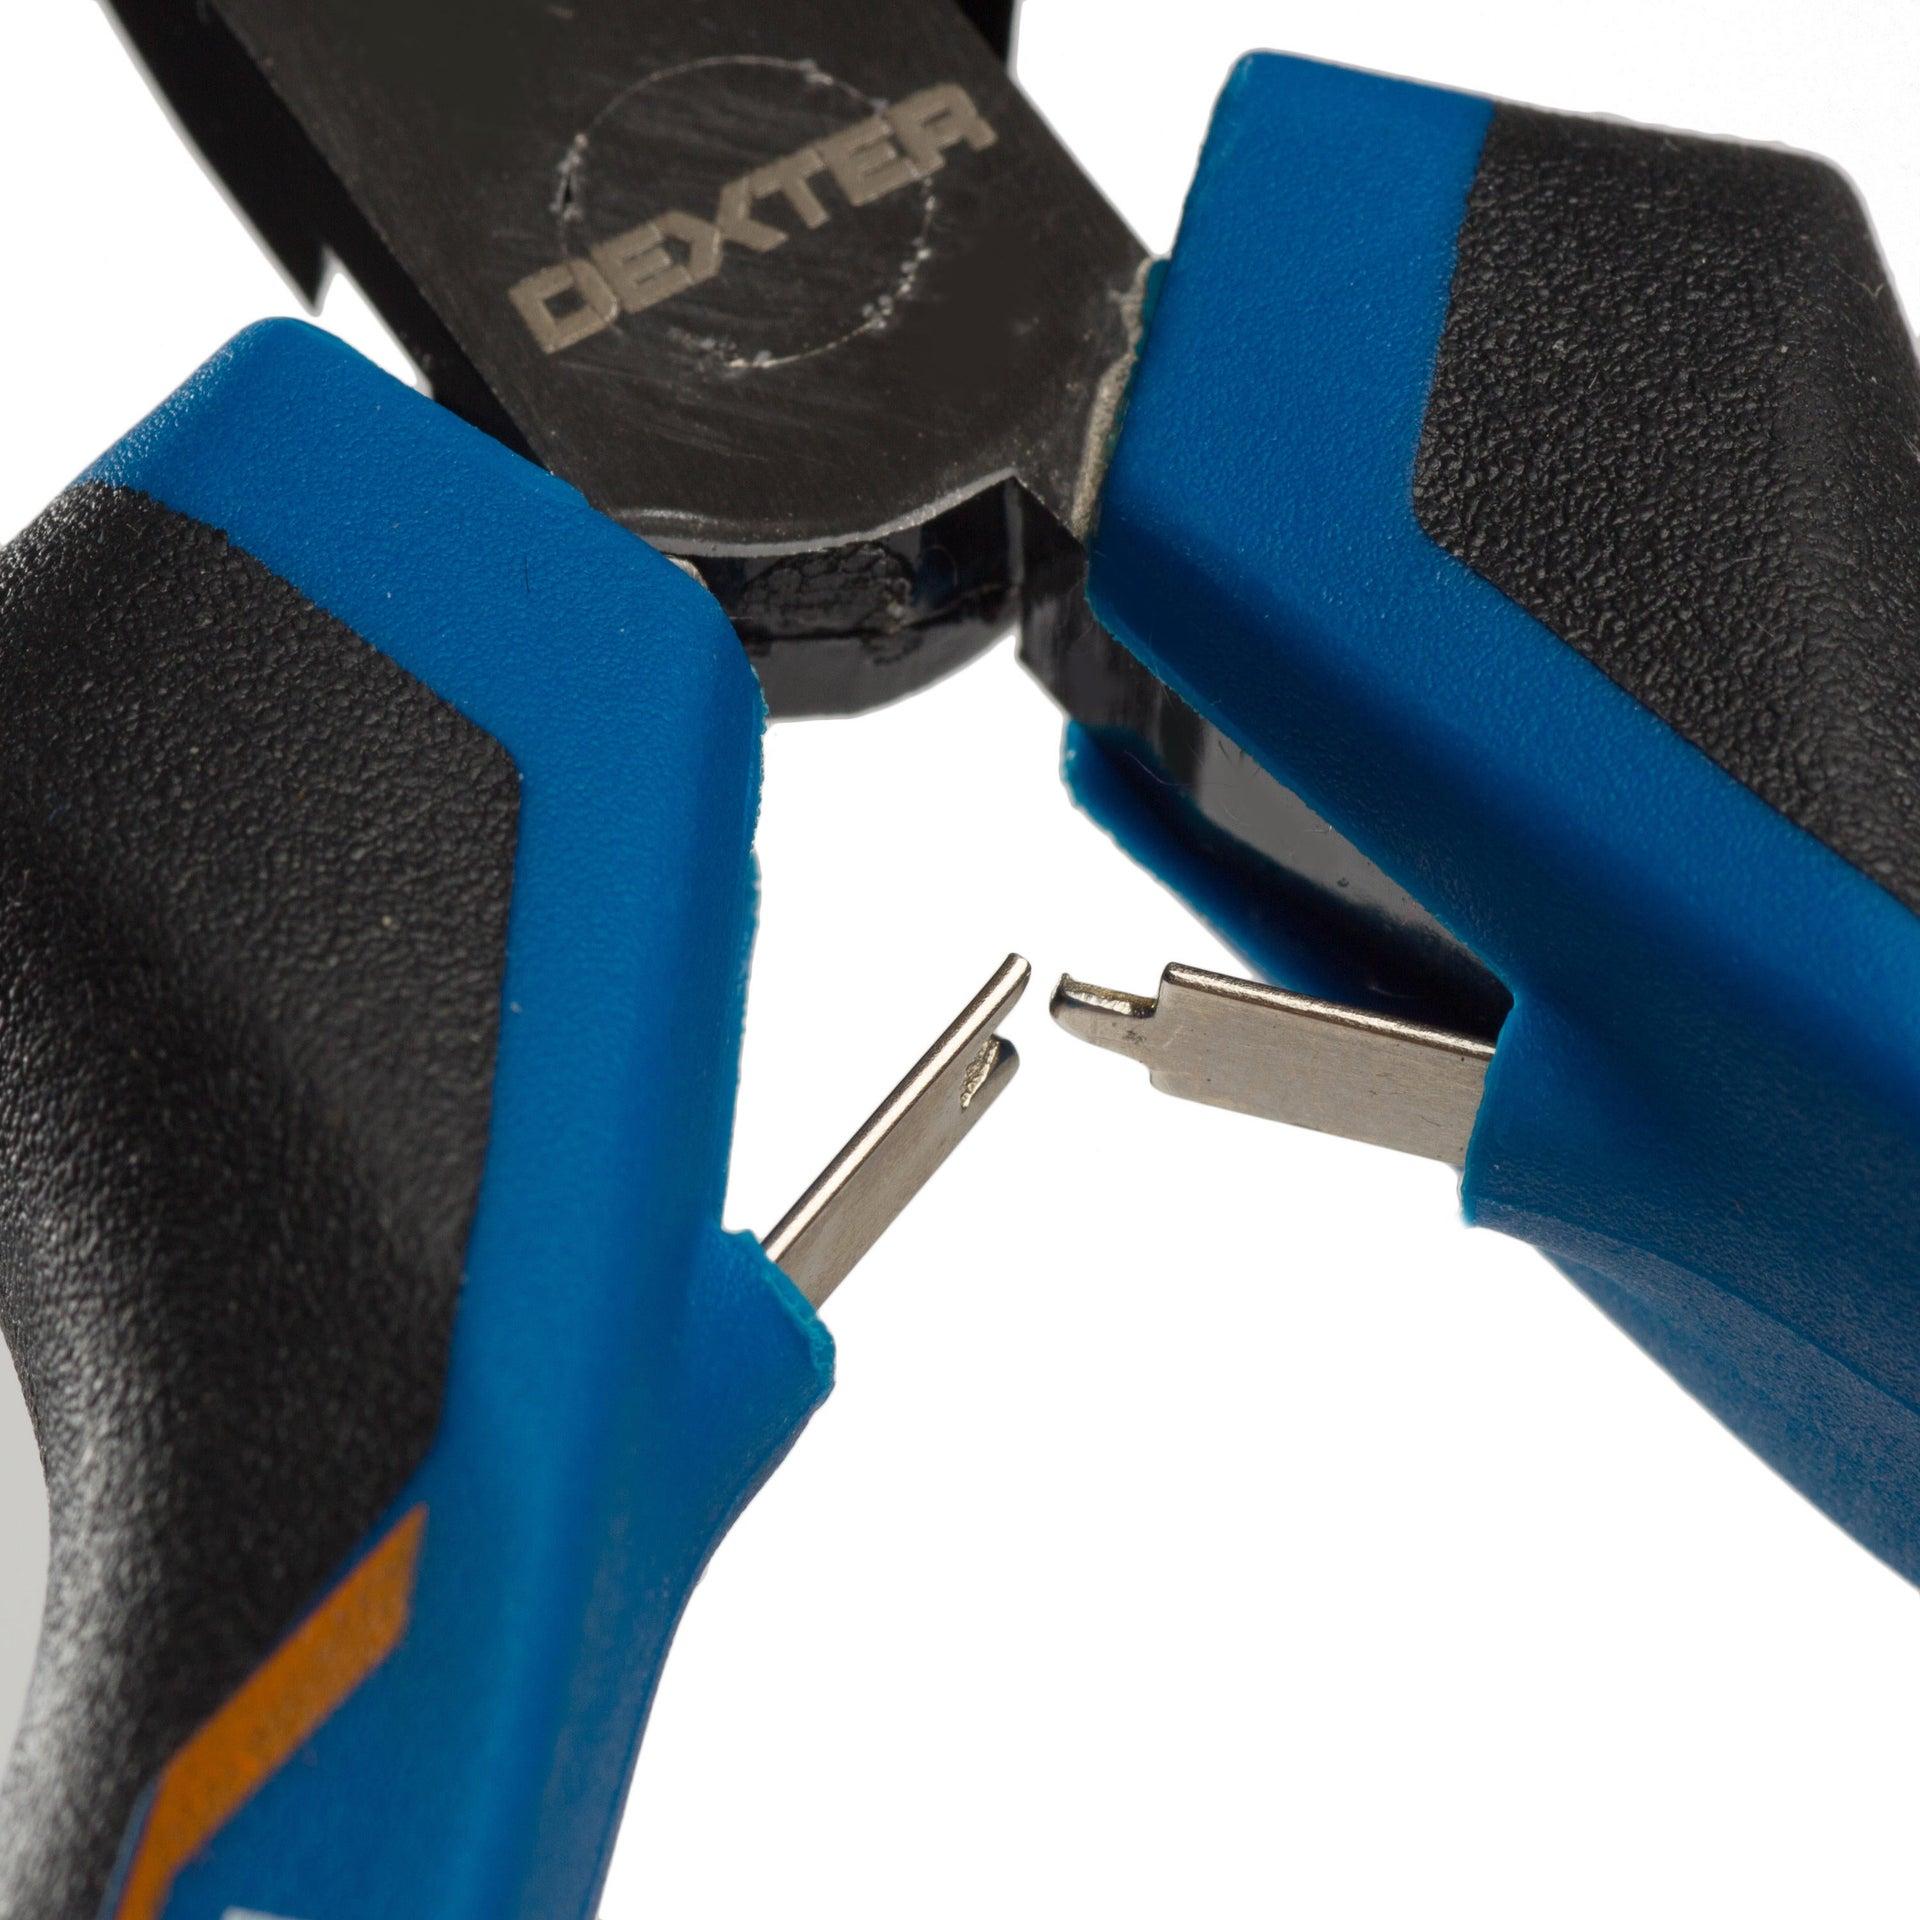 Set di pinze DEXTER in acciaio cromo vanadio 6 pezzi - 19